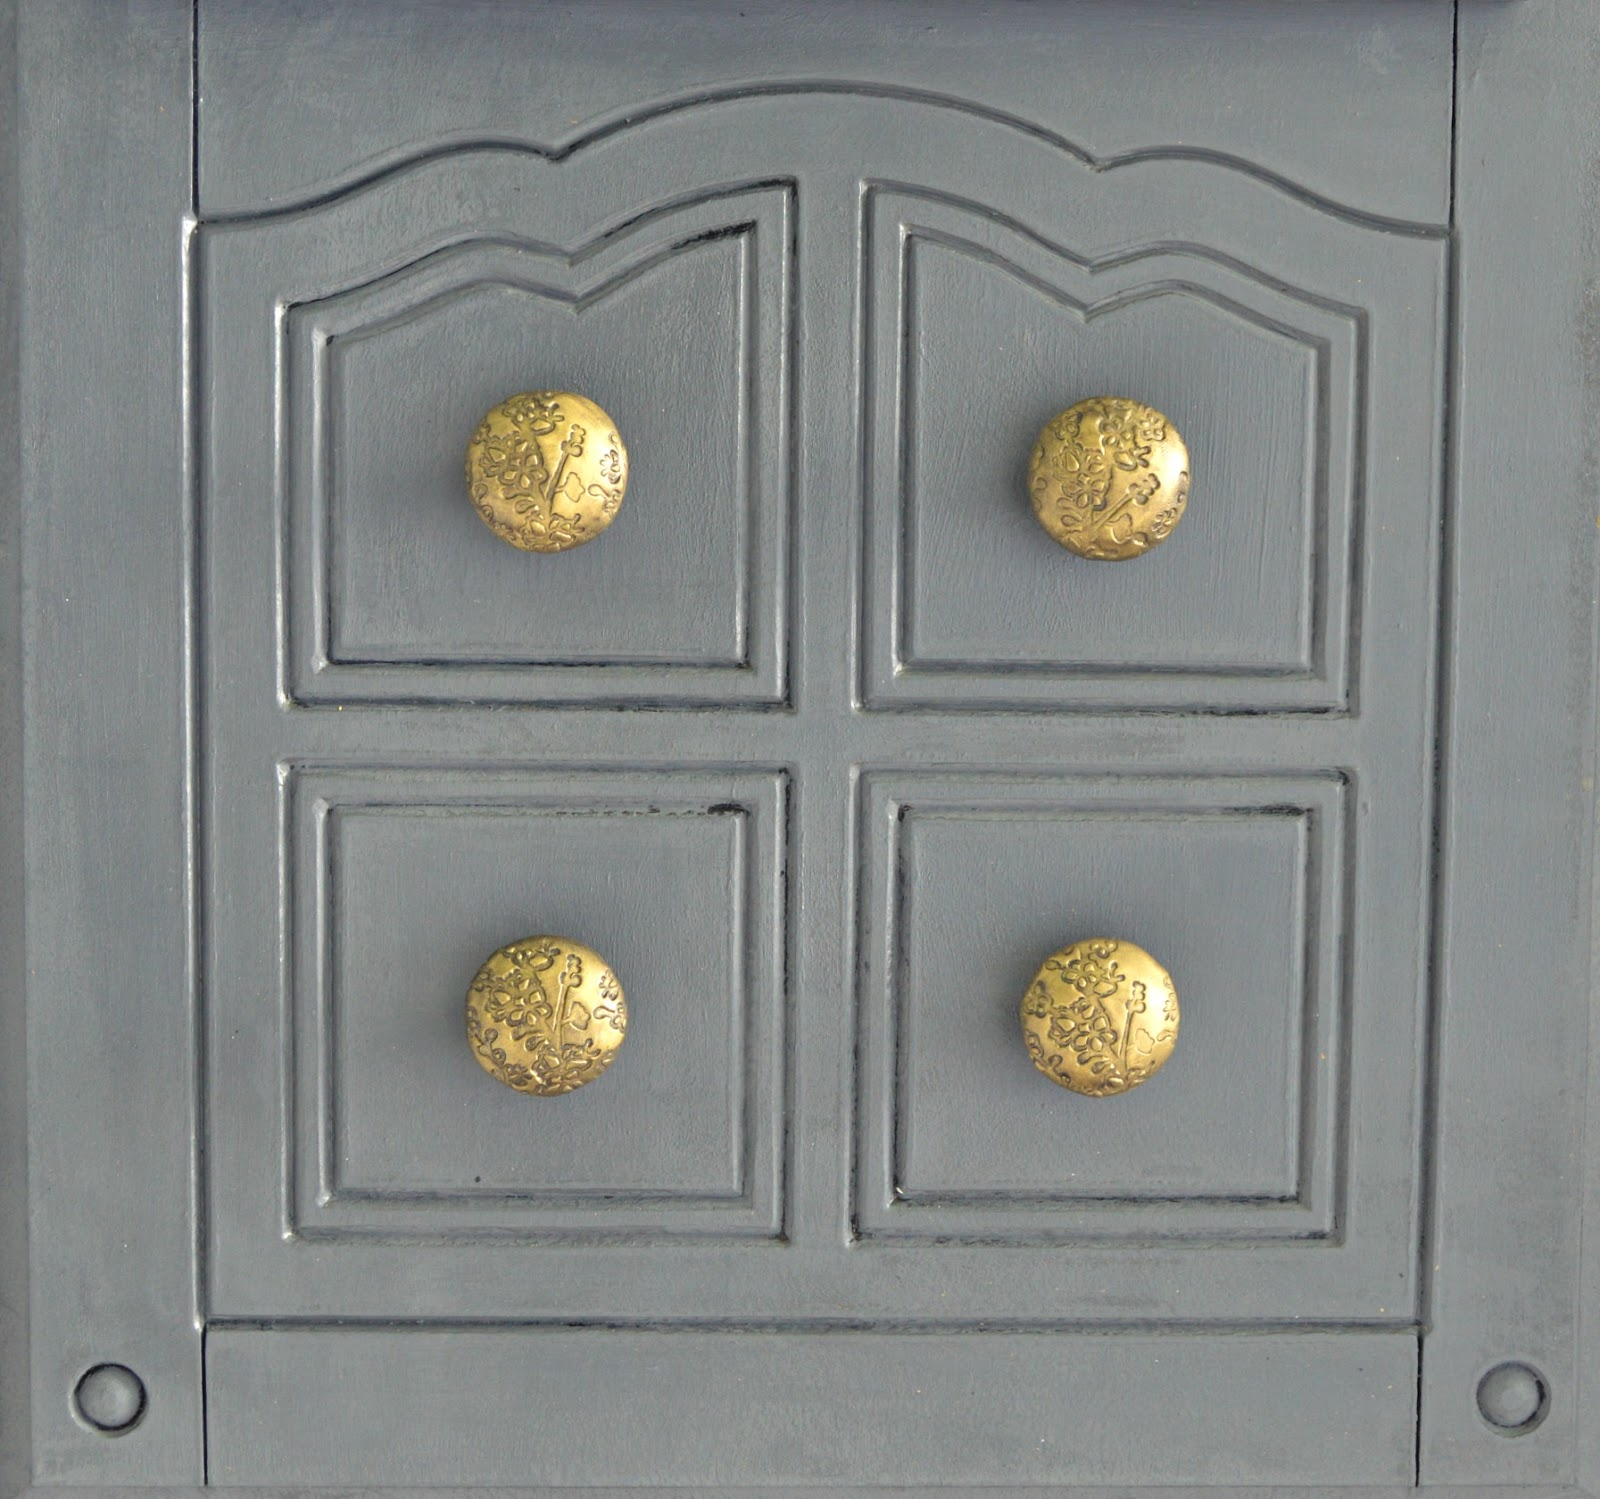 DIY polymer clay door knobs